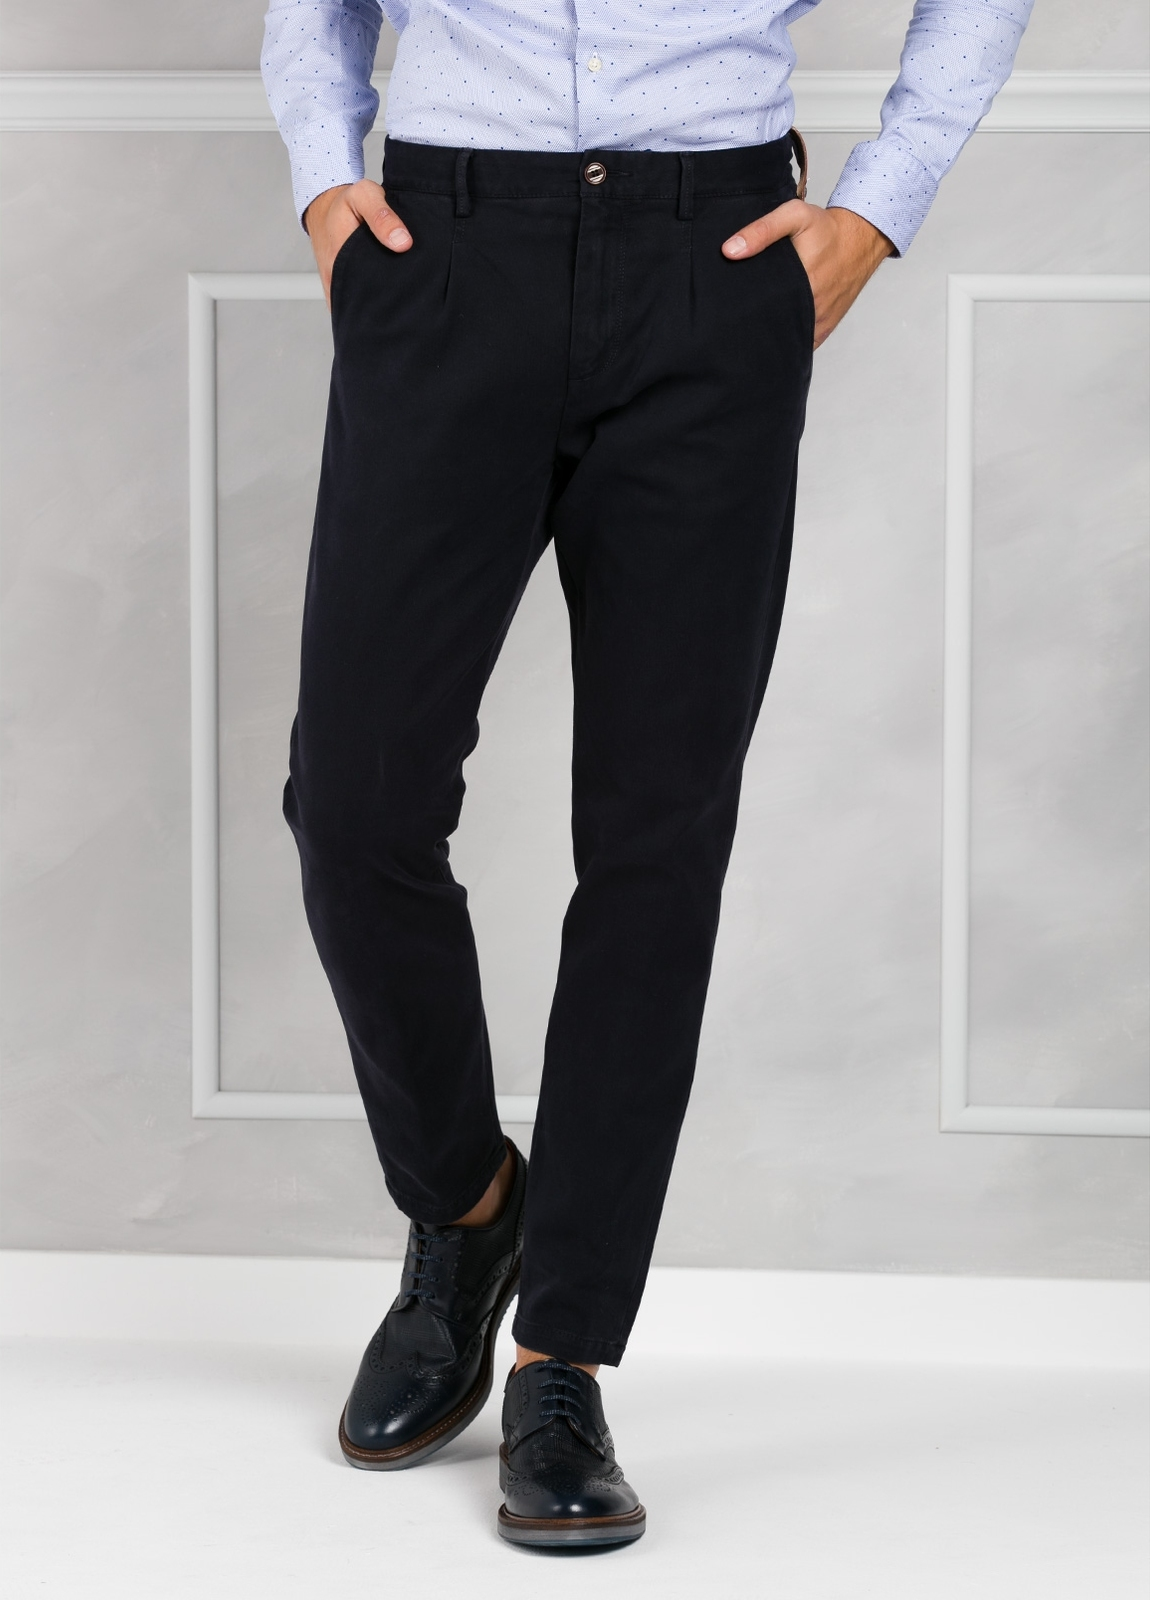 Pantalón chino ligeramente slim fit modelo GASPAR color azul marino. 100% Algodón tricotina.